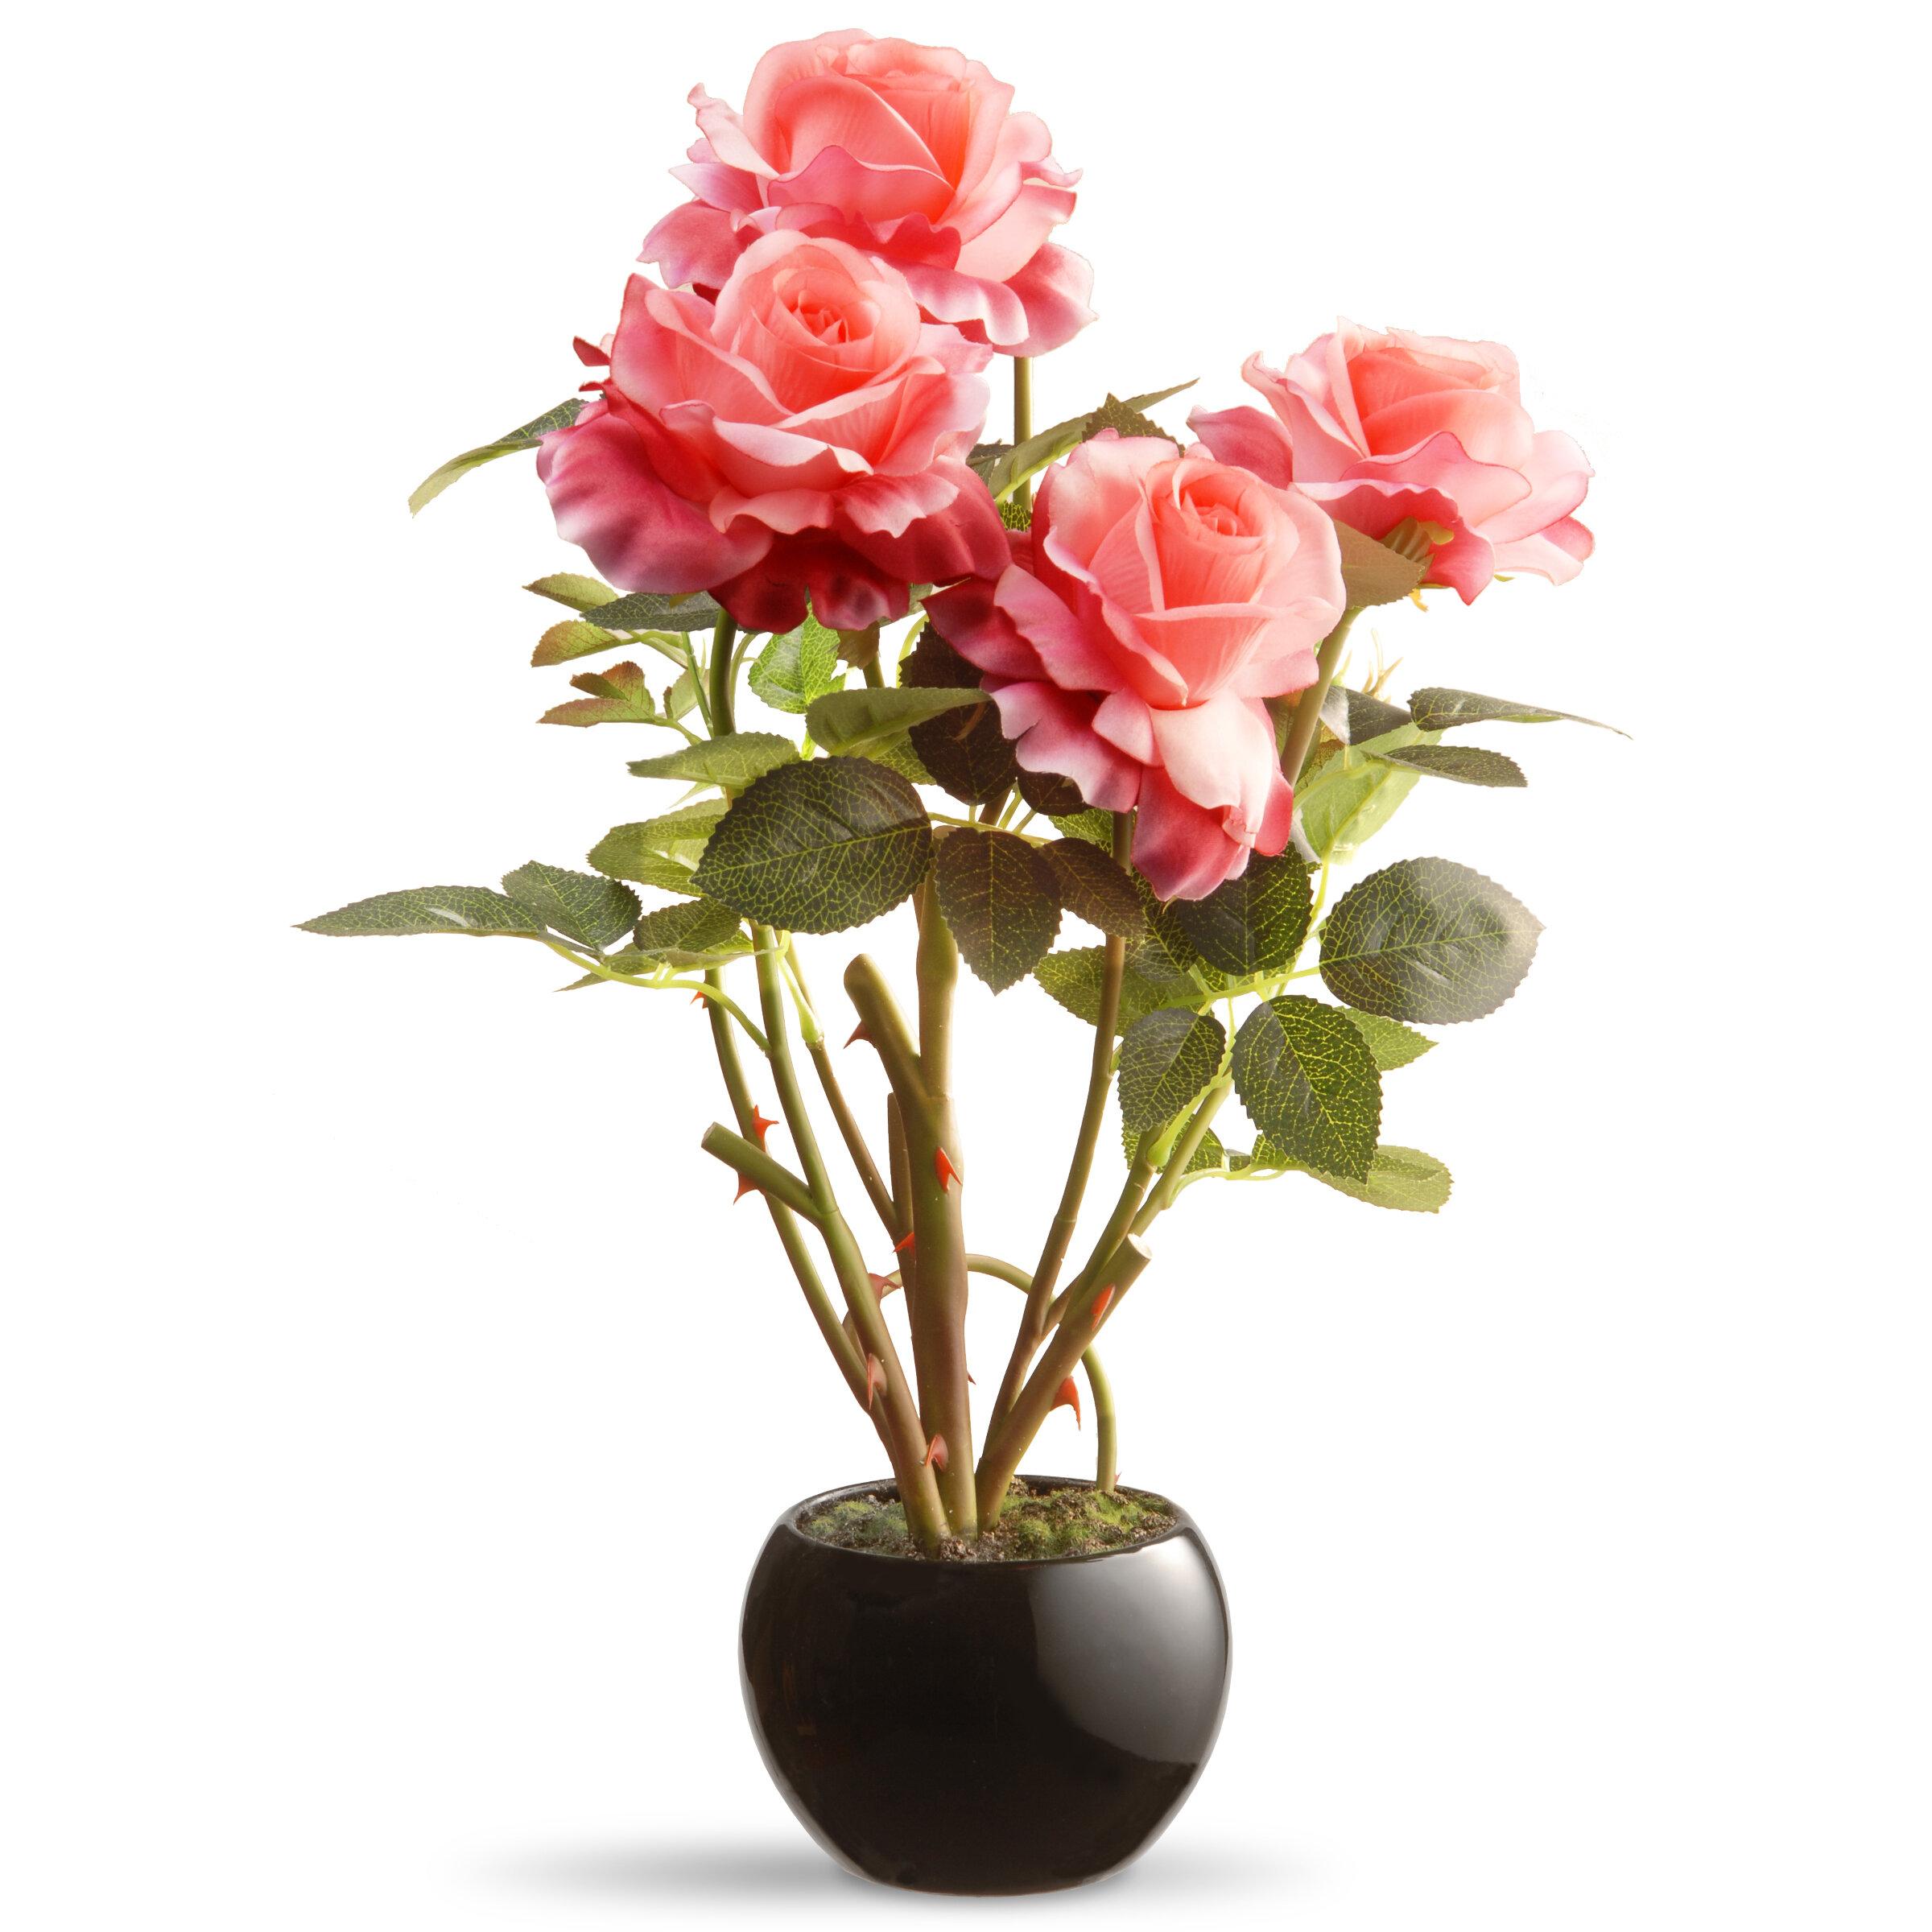 225 & Rose Flowers in Pot